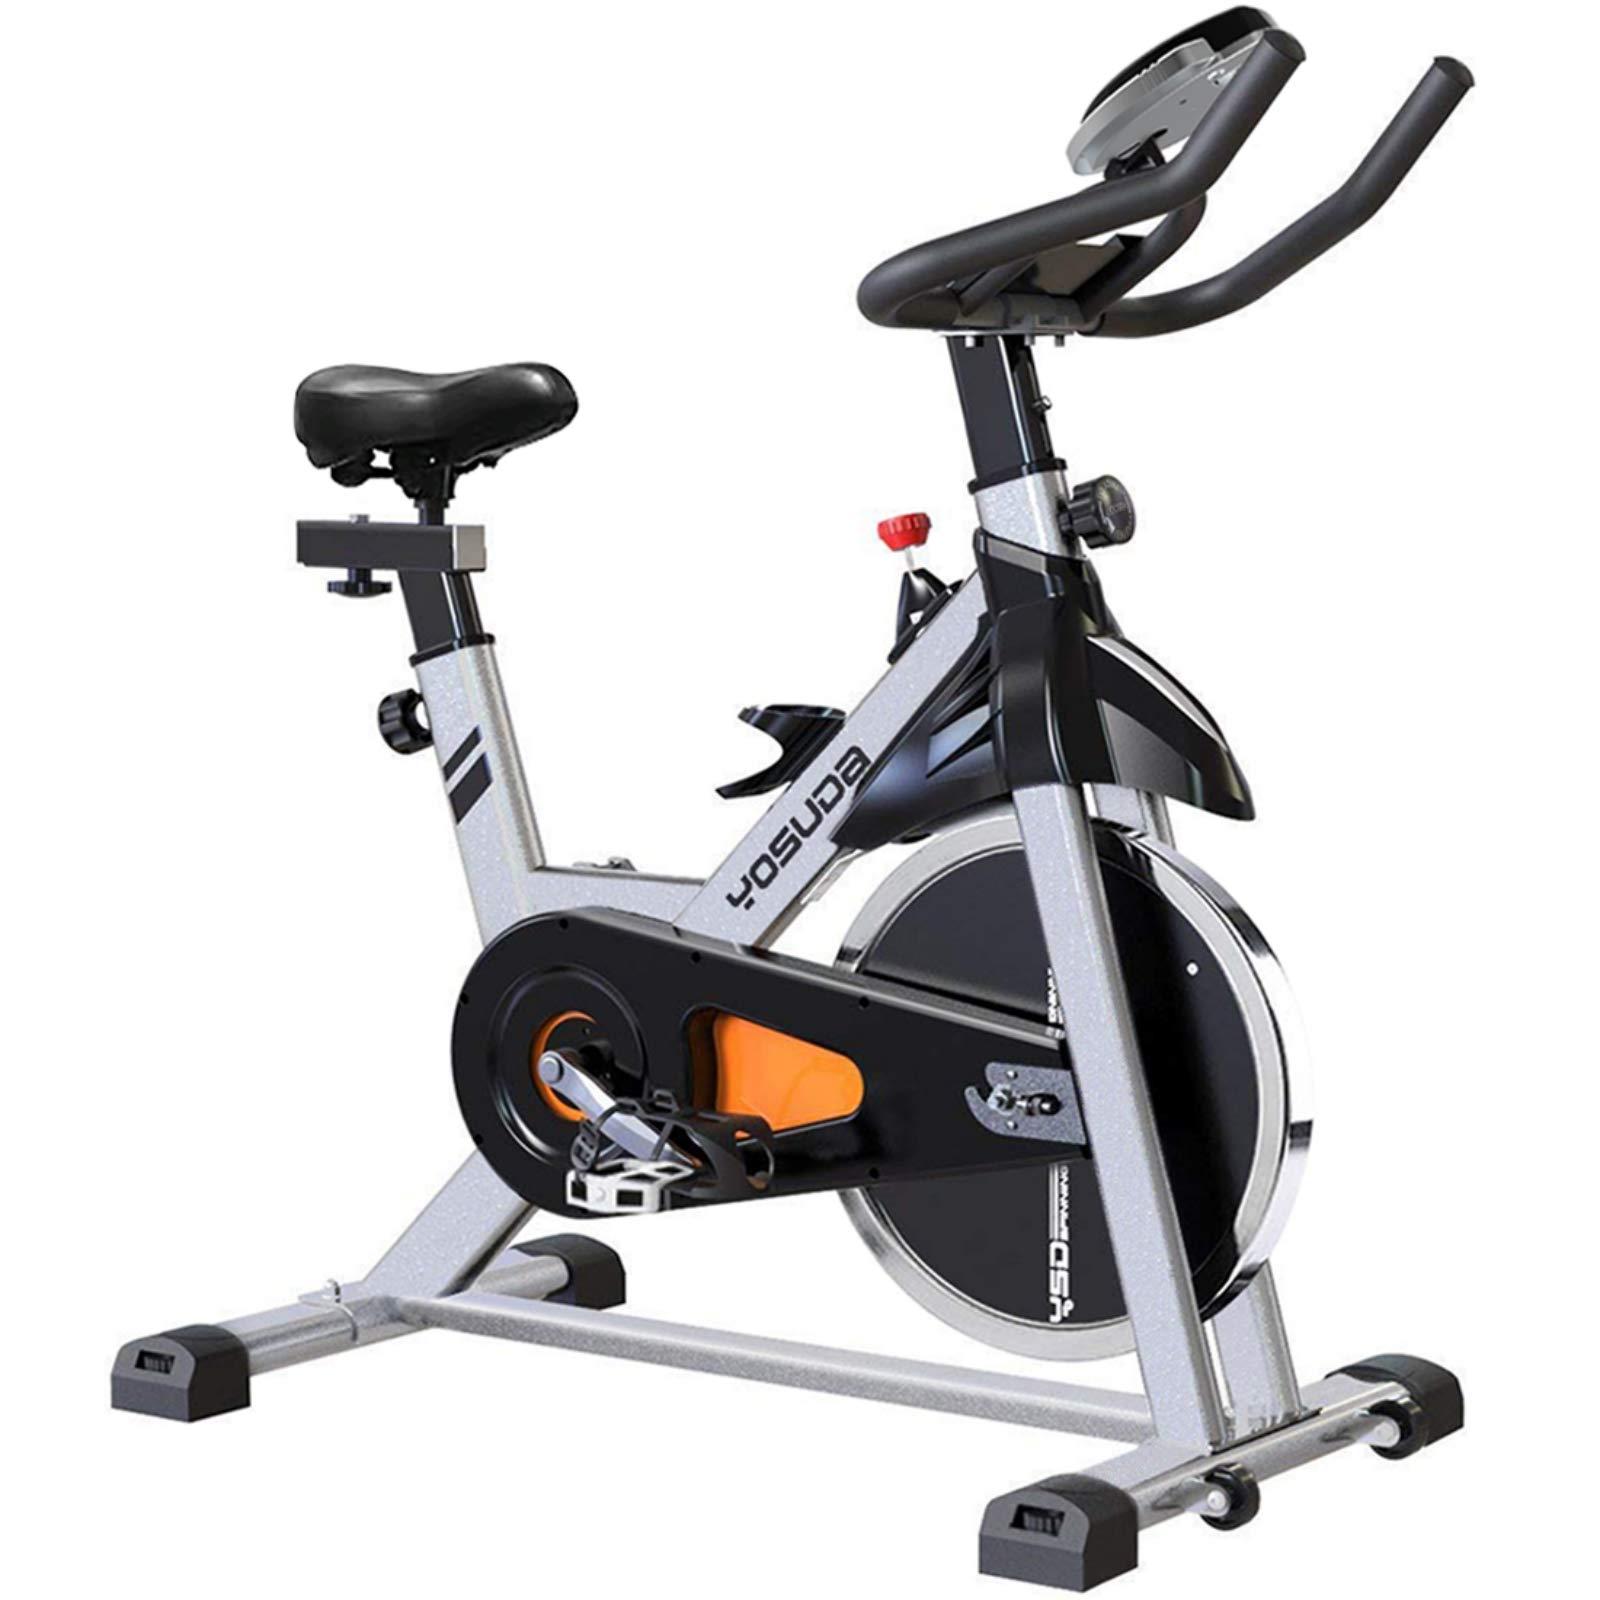 Best exercise bikes Singapore -Yosuda Indoor Cycling Bike